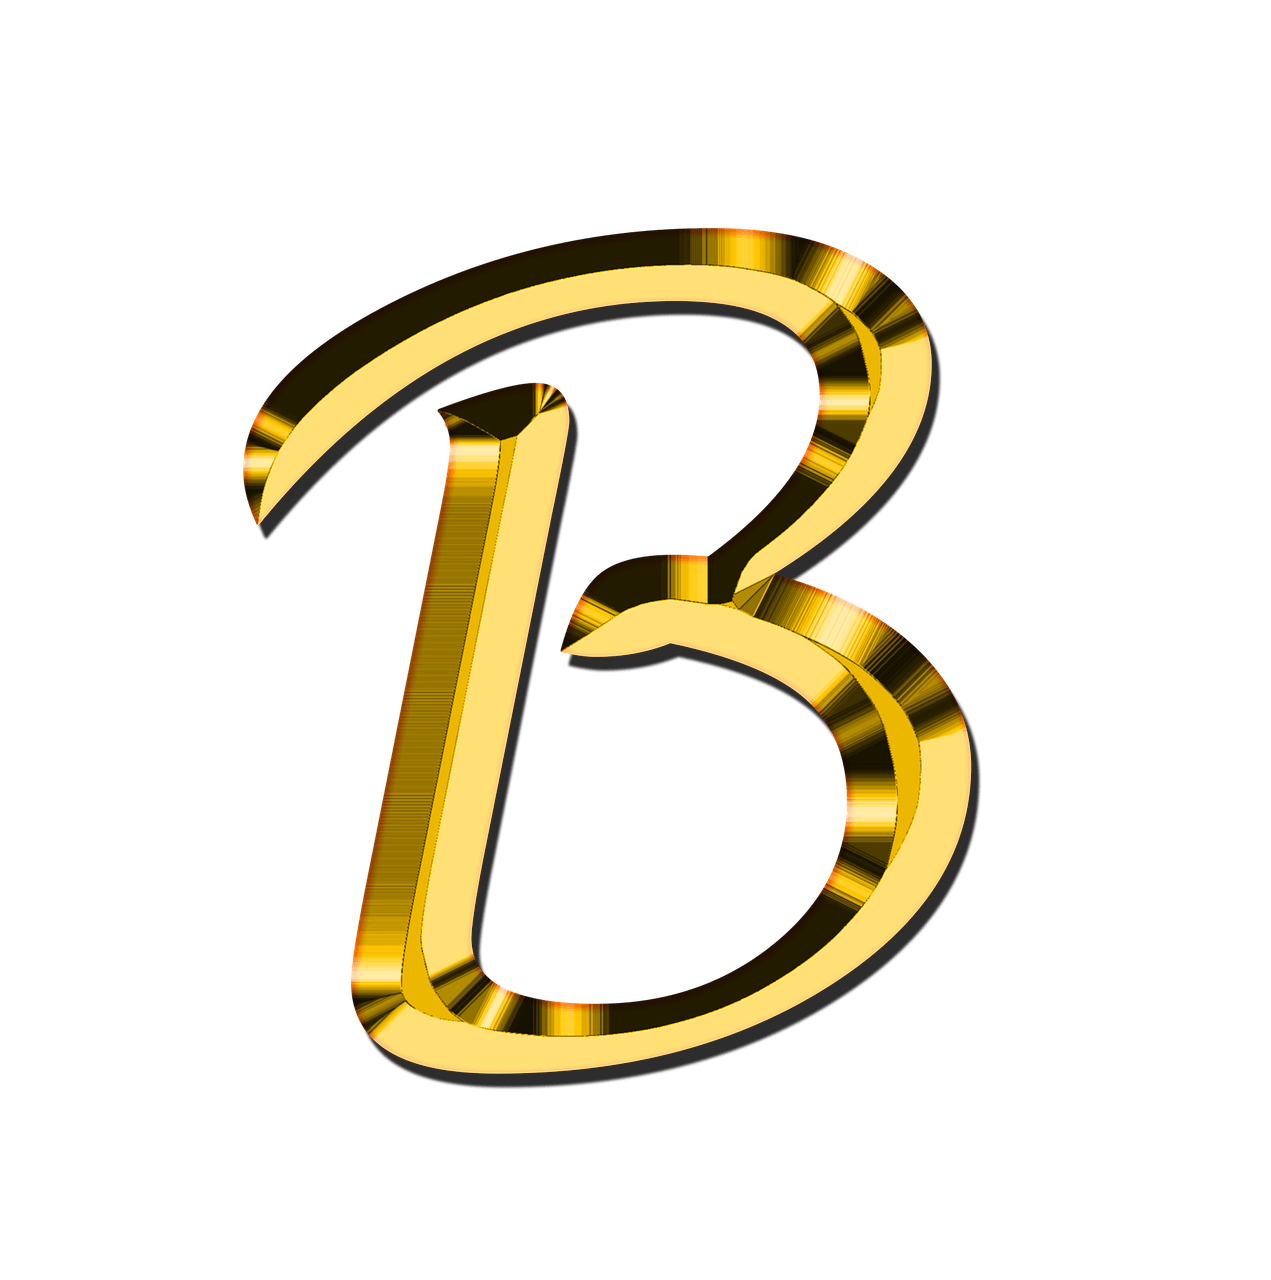 Letter b clipart clip art free stock Capital Letter B transparent PNG - StickPNG clip art free stock